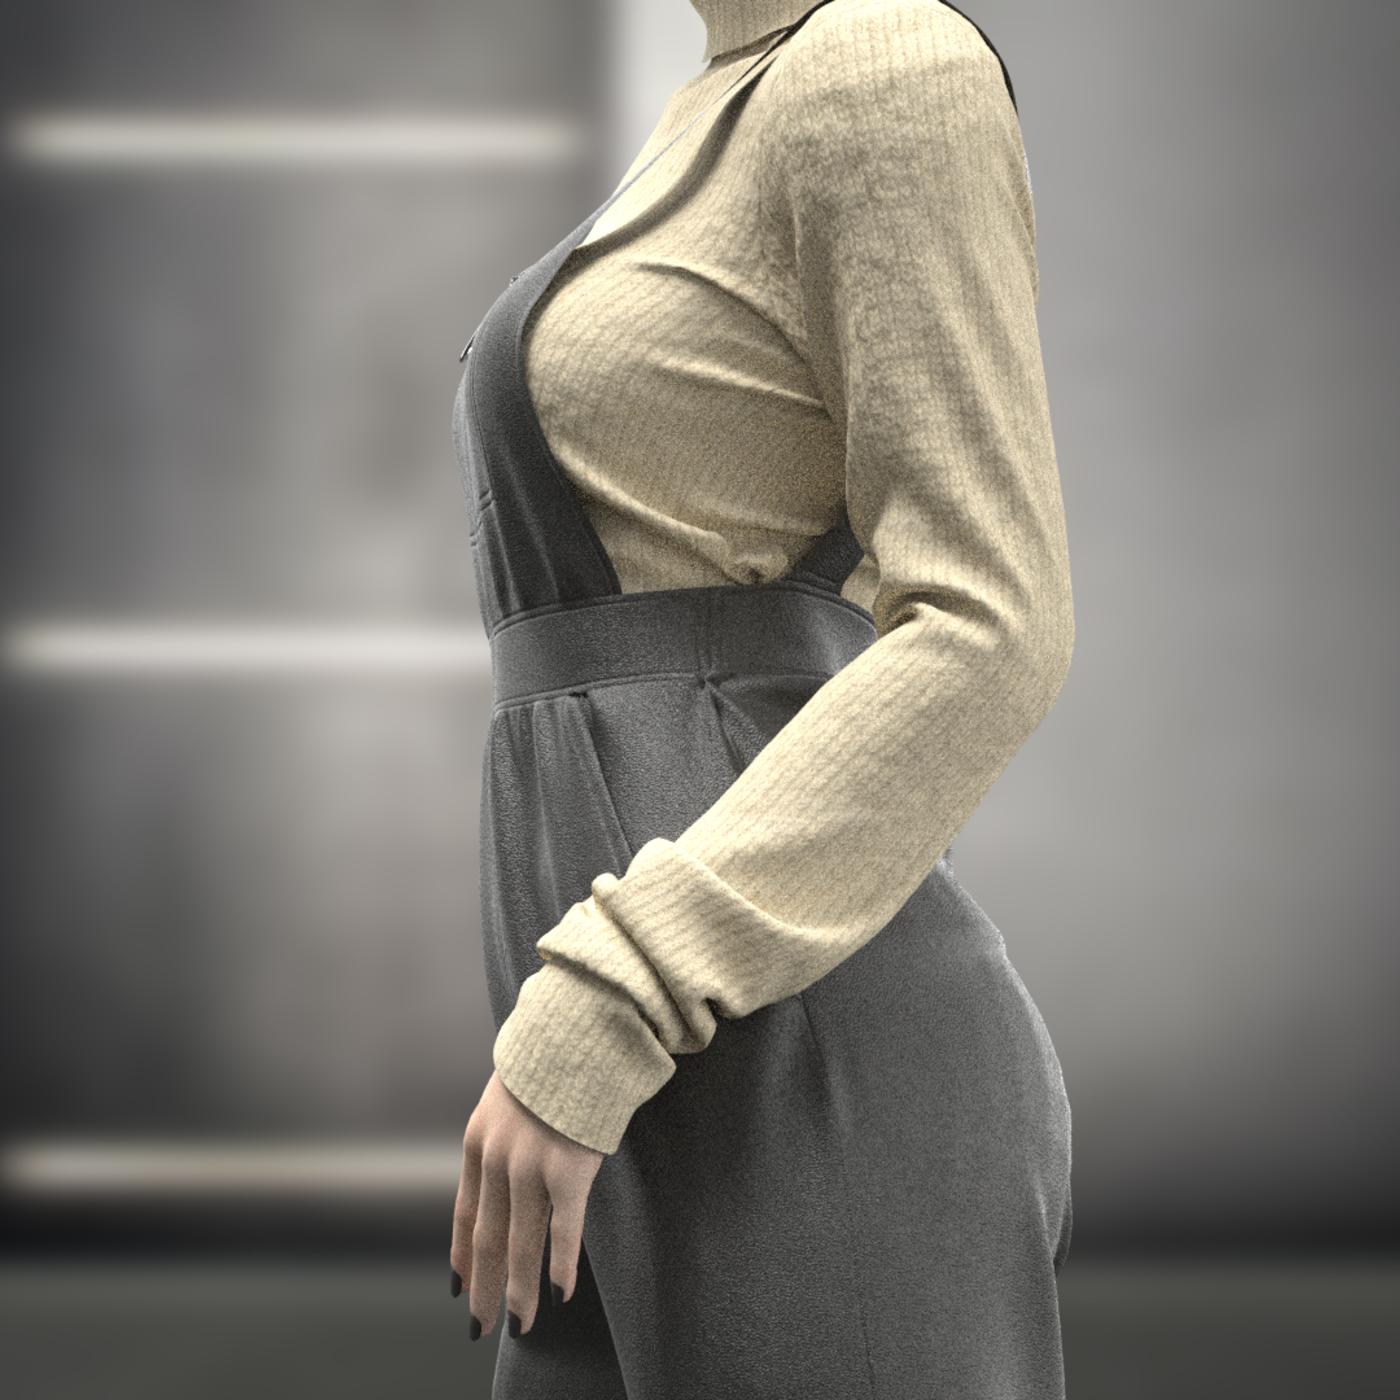 Female Overalls